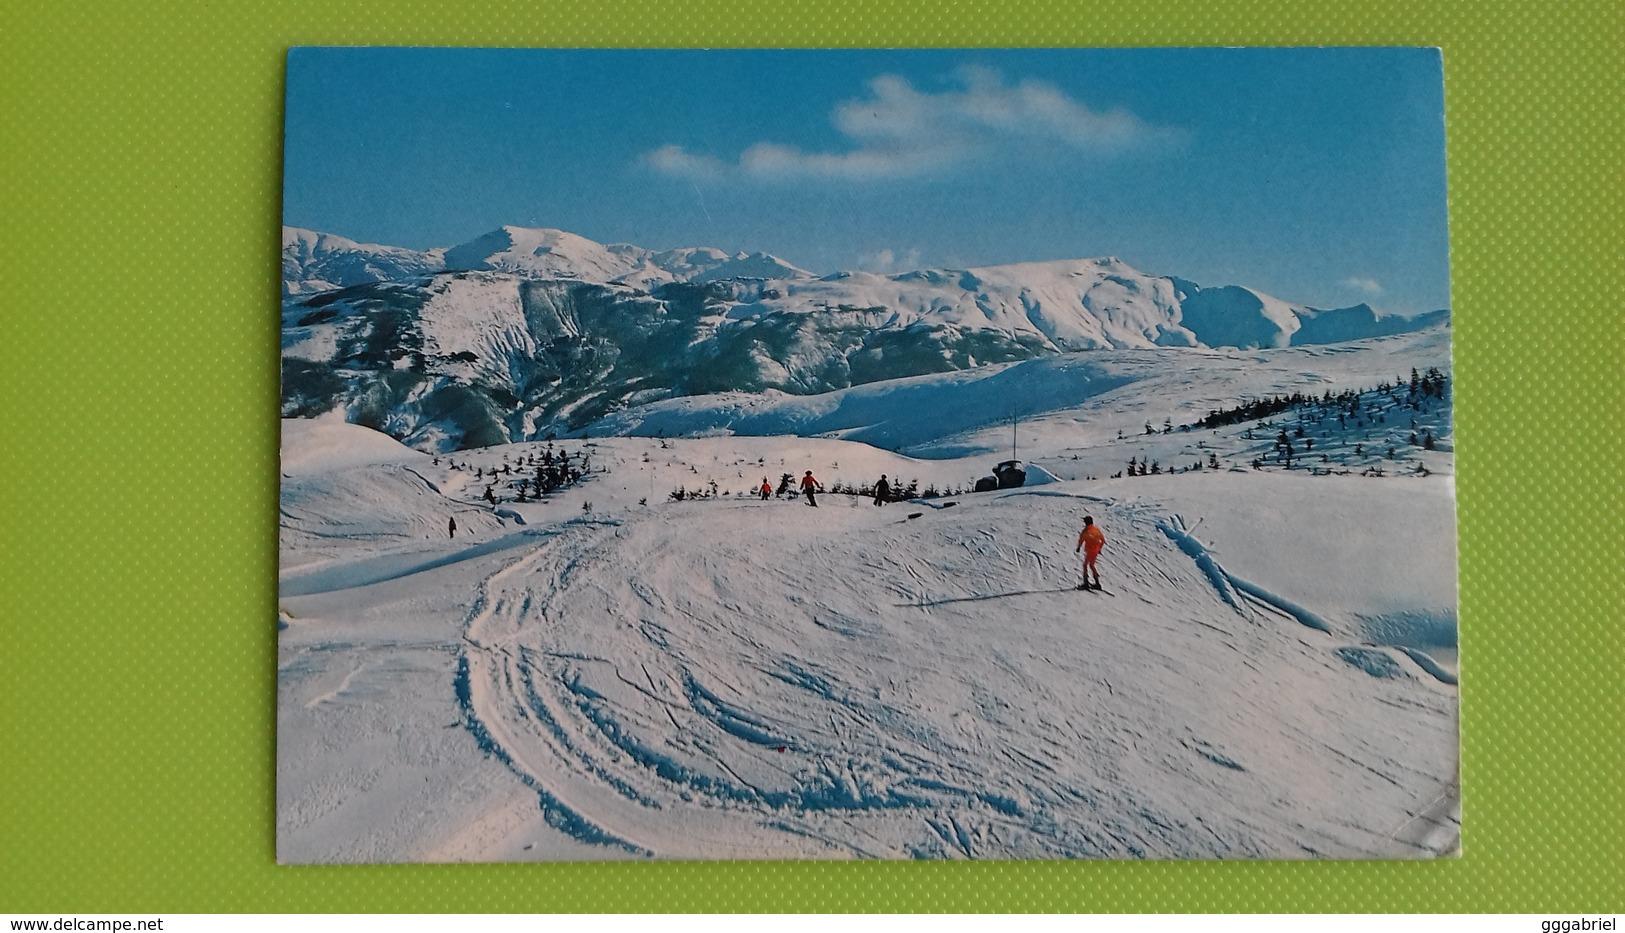 Cartolina FANANO - MO - Viaggiata - Postcard - Cimoncino 2000 - Tanta Neve E Tanto Sole - Panoramica - Modena